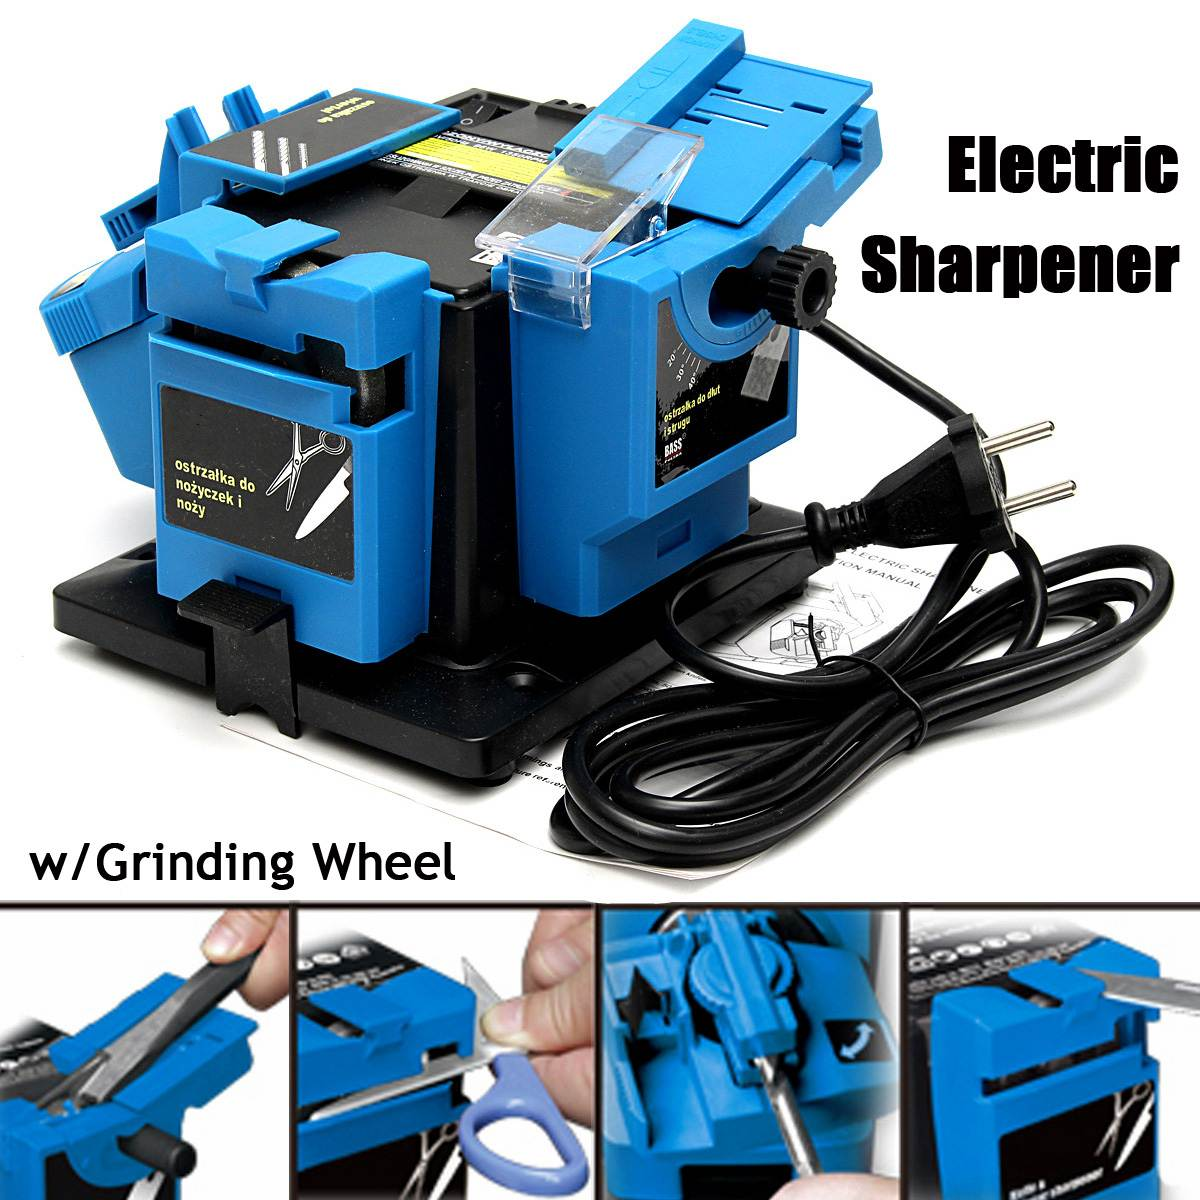 220V Electric Household Sharpener Grinding Tool HSS Drill Bit Knife Scissor Sharpener Grinder